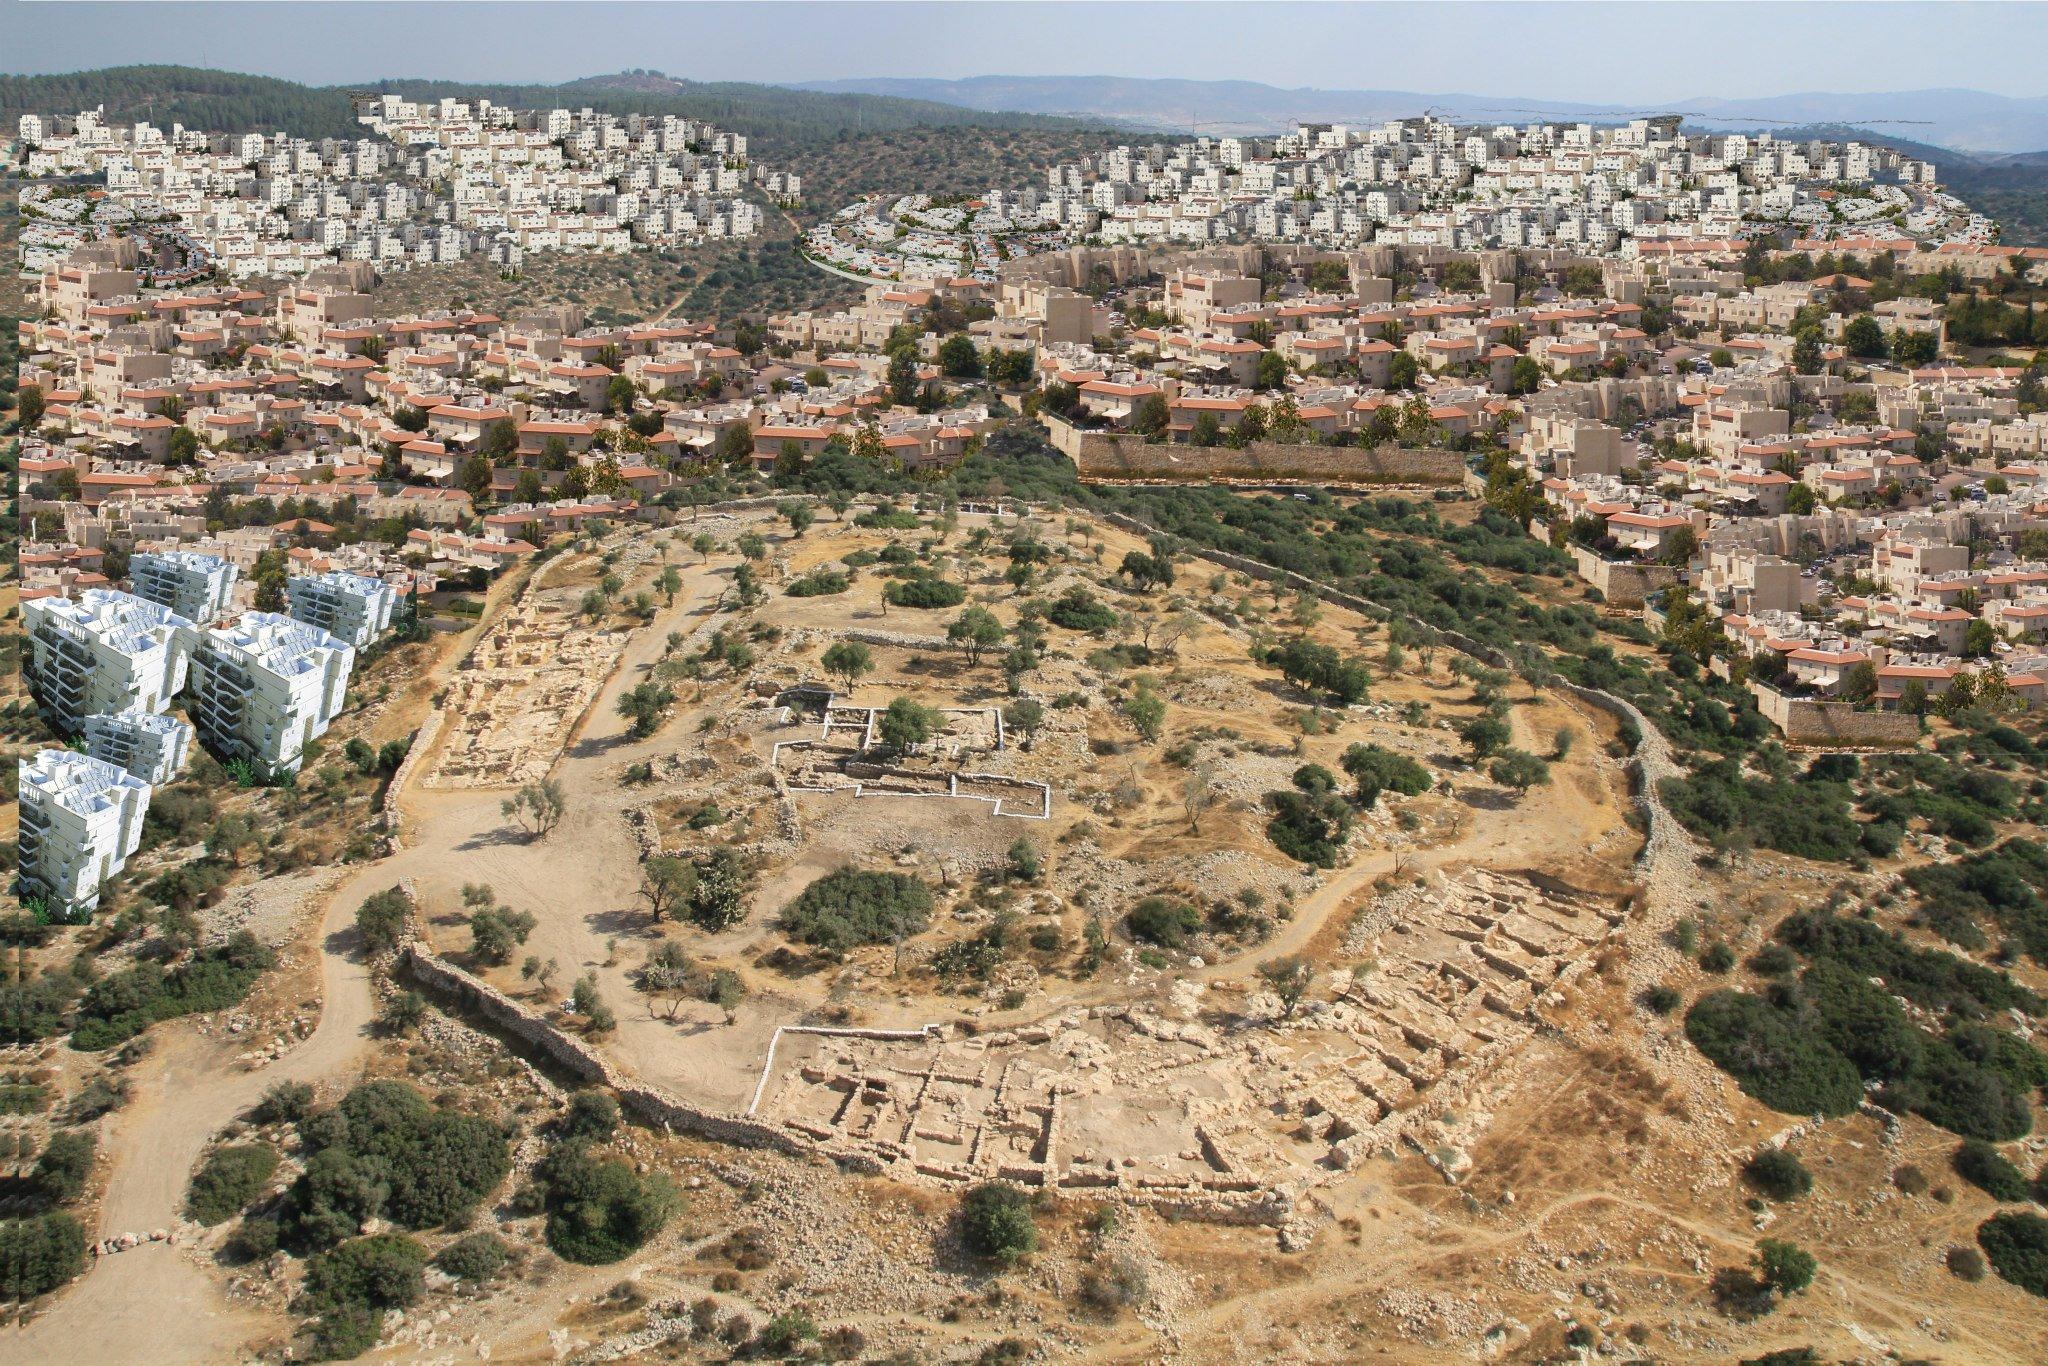 Beth Shemesh Judah: Khirbet Qeiyafa To Be Enveloped By City Expansion